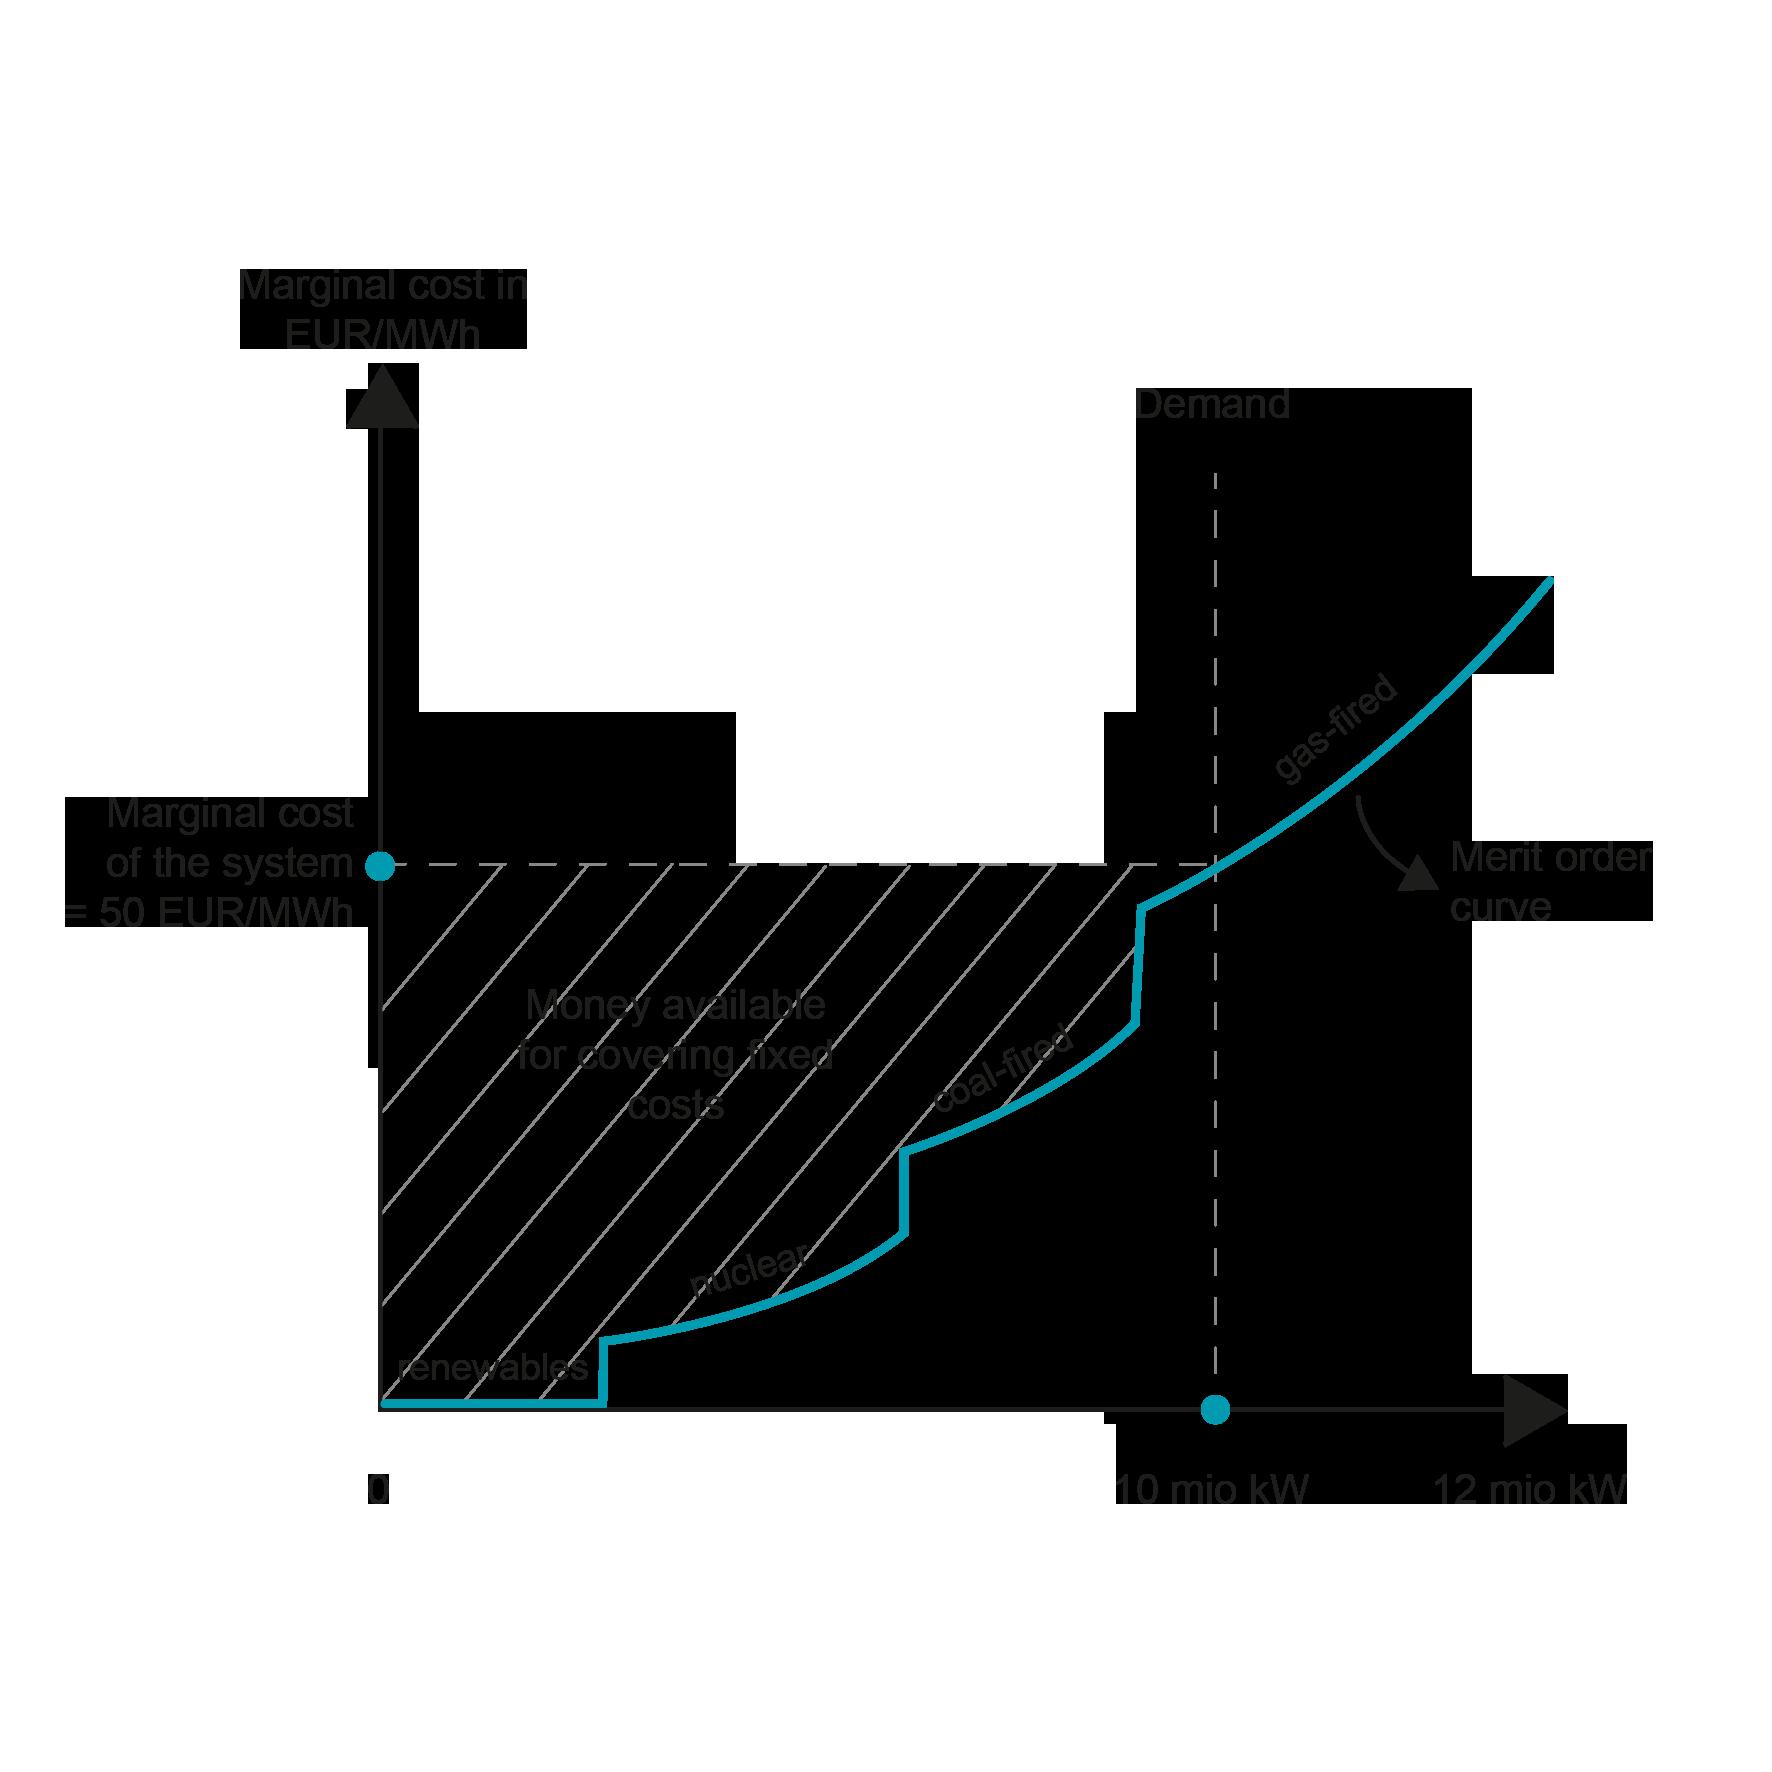 Margin Pricing: ENergytics By E&C Consultants